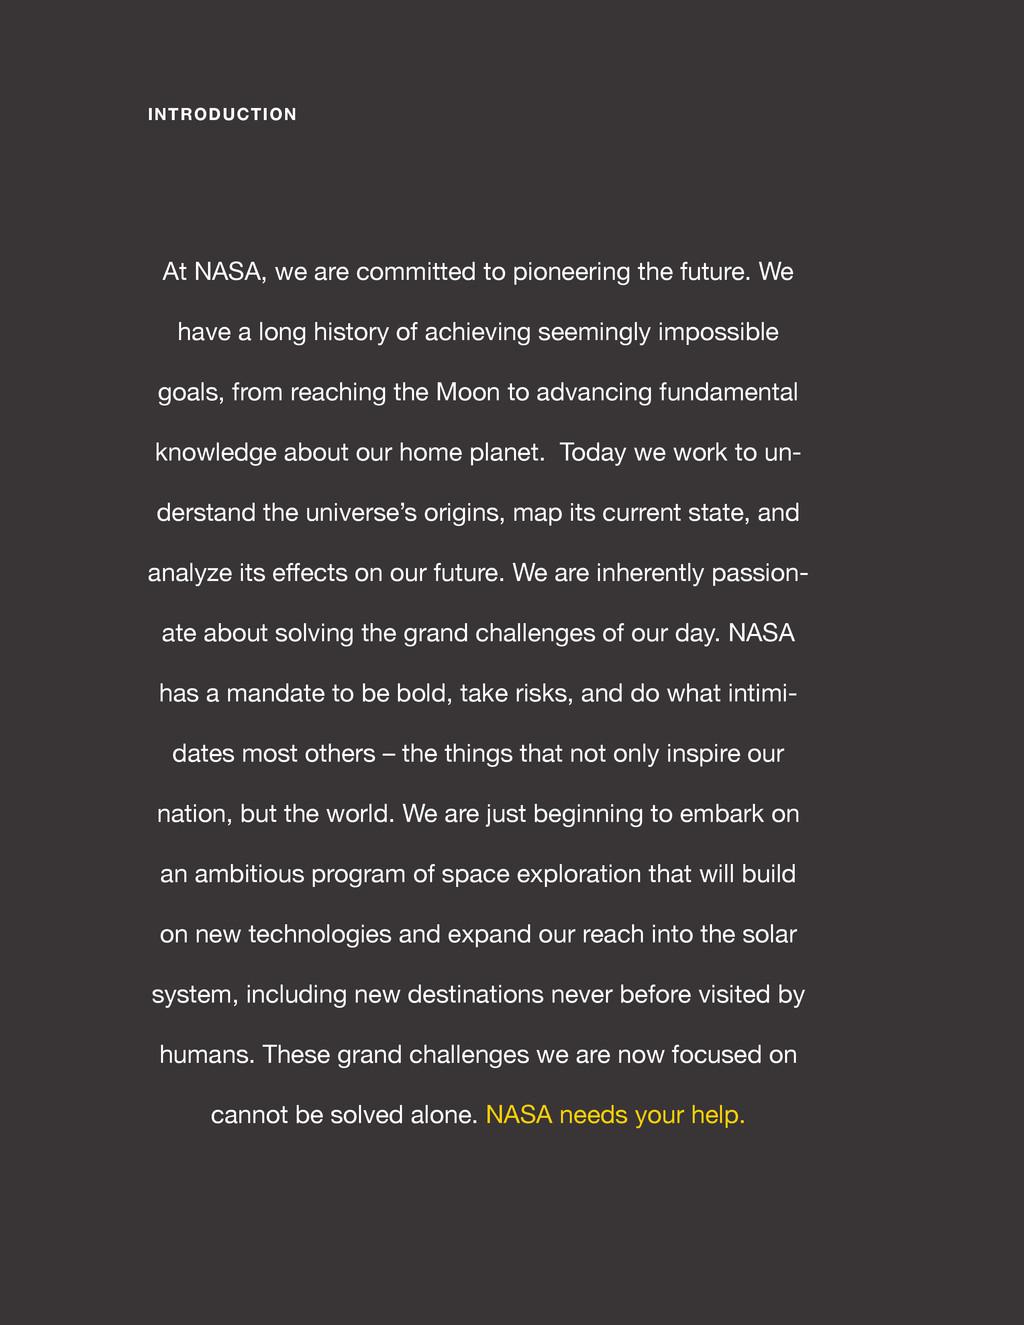 spaceappschallenge.org INTRODUCTION At NASA, we...